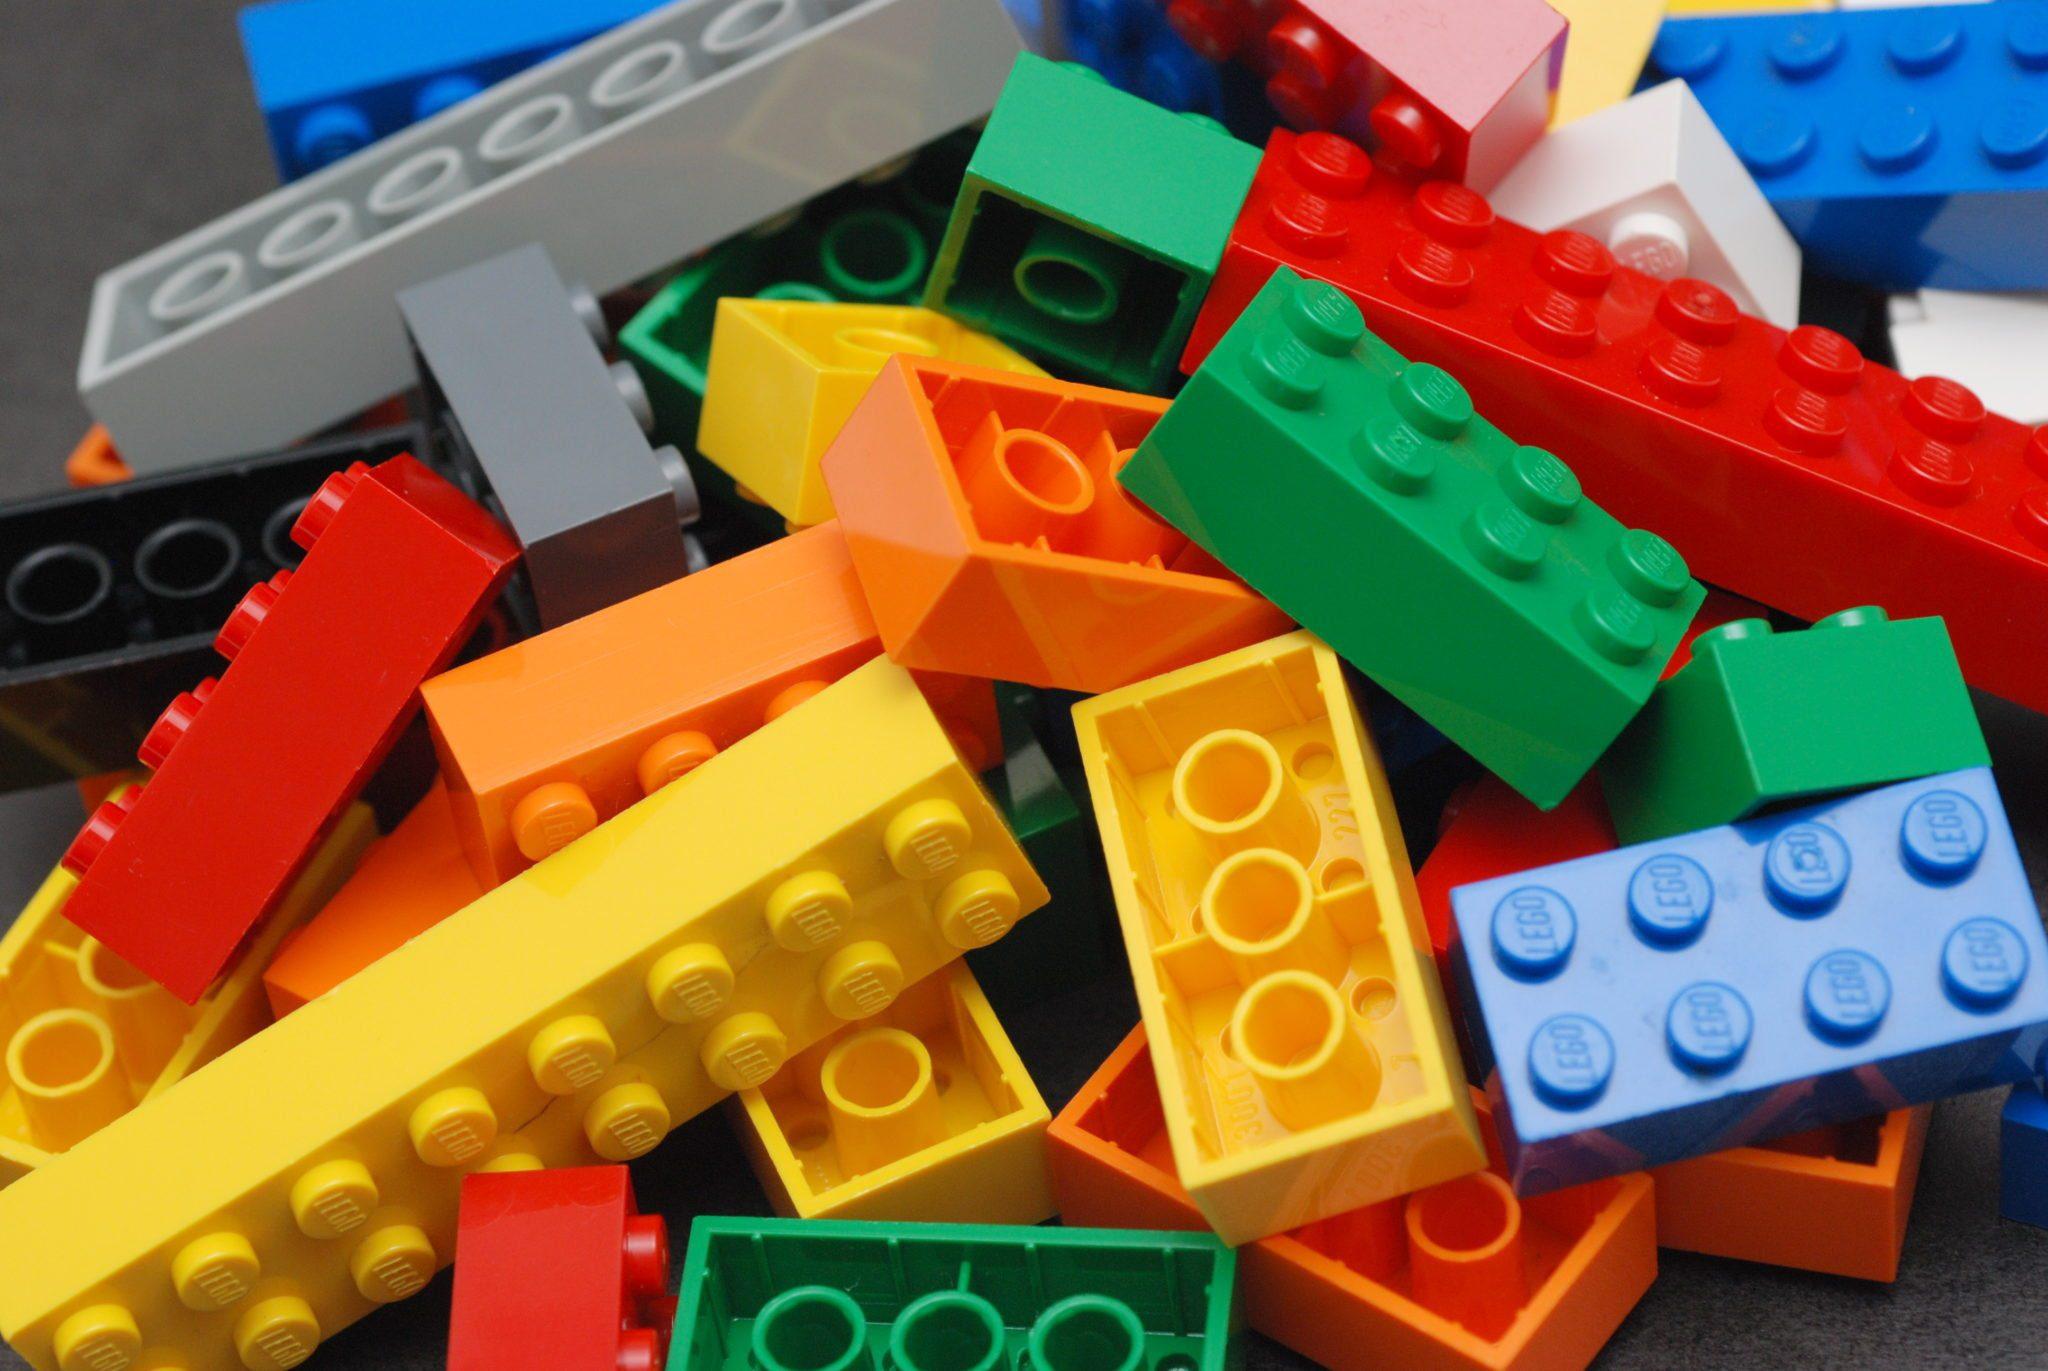 A Lego Brickumentary (DVD): The Power of Community